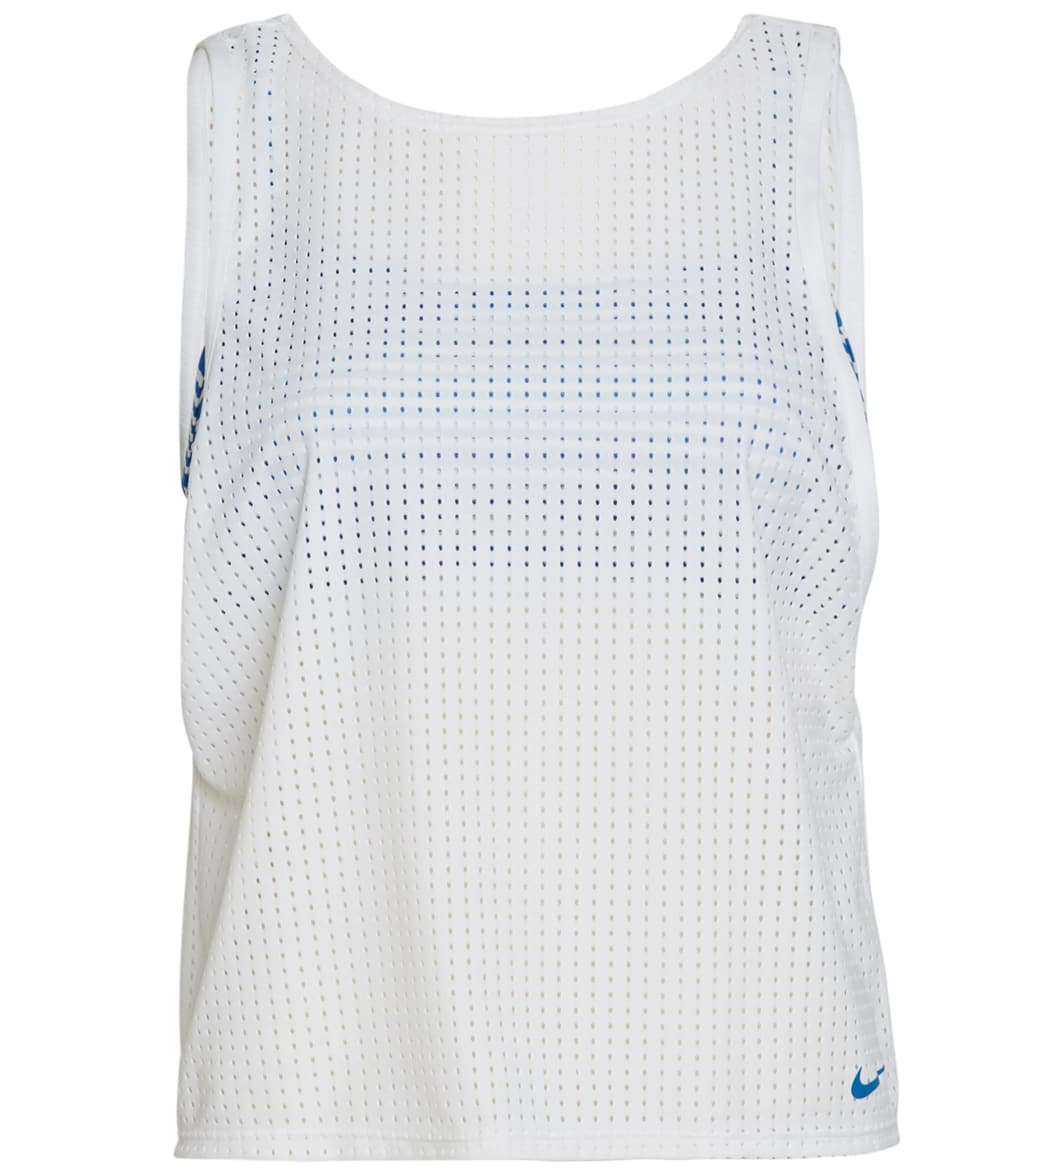 Nike Sport Mesh Convertible Layered Tankini Top